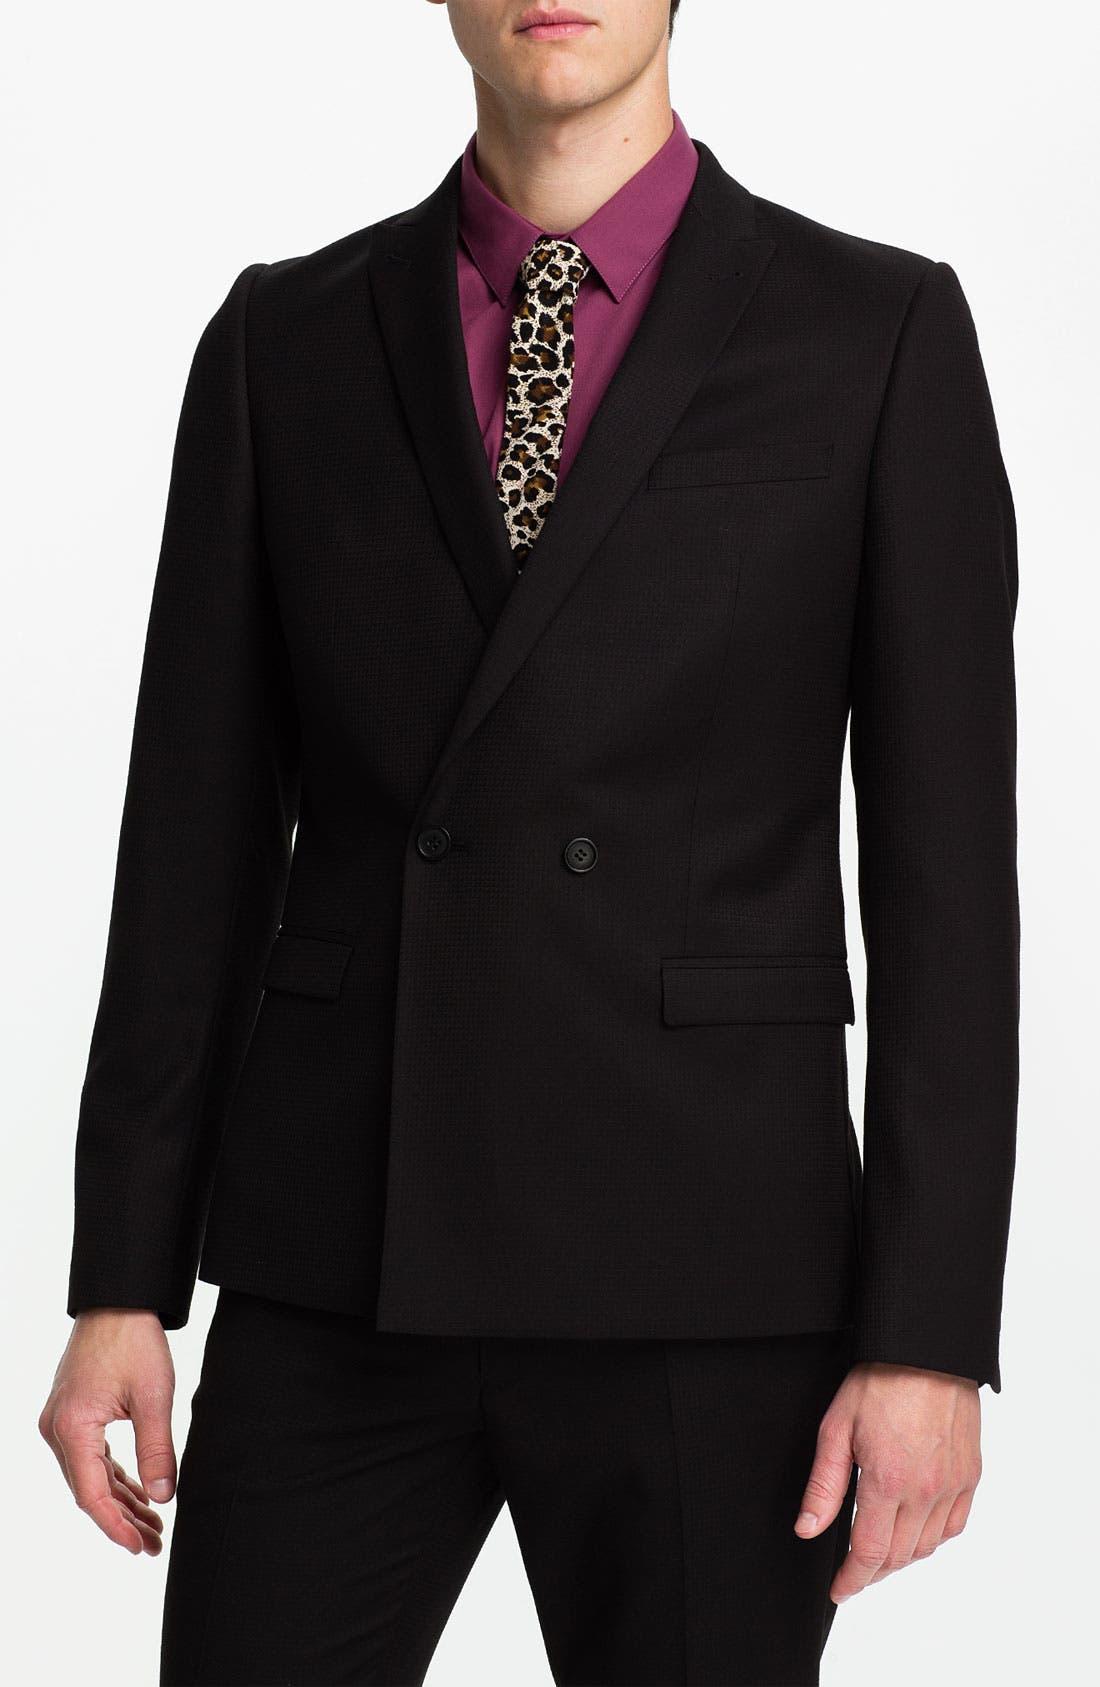 Main Image - Topman Grid Check Double Breasted Tuxedo Jacket